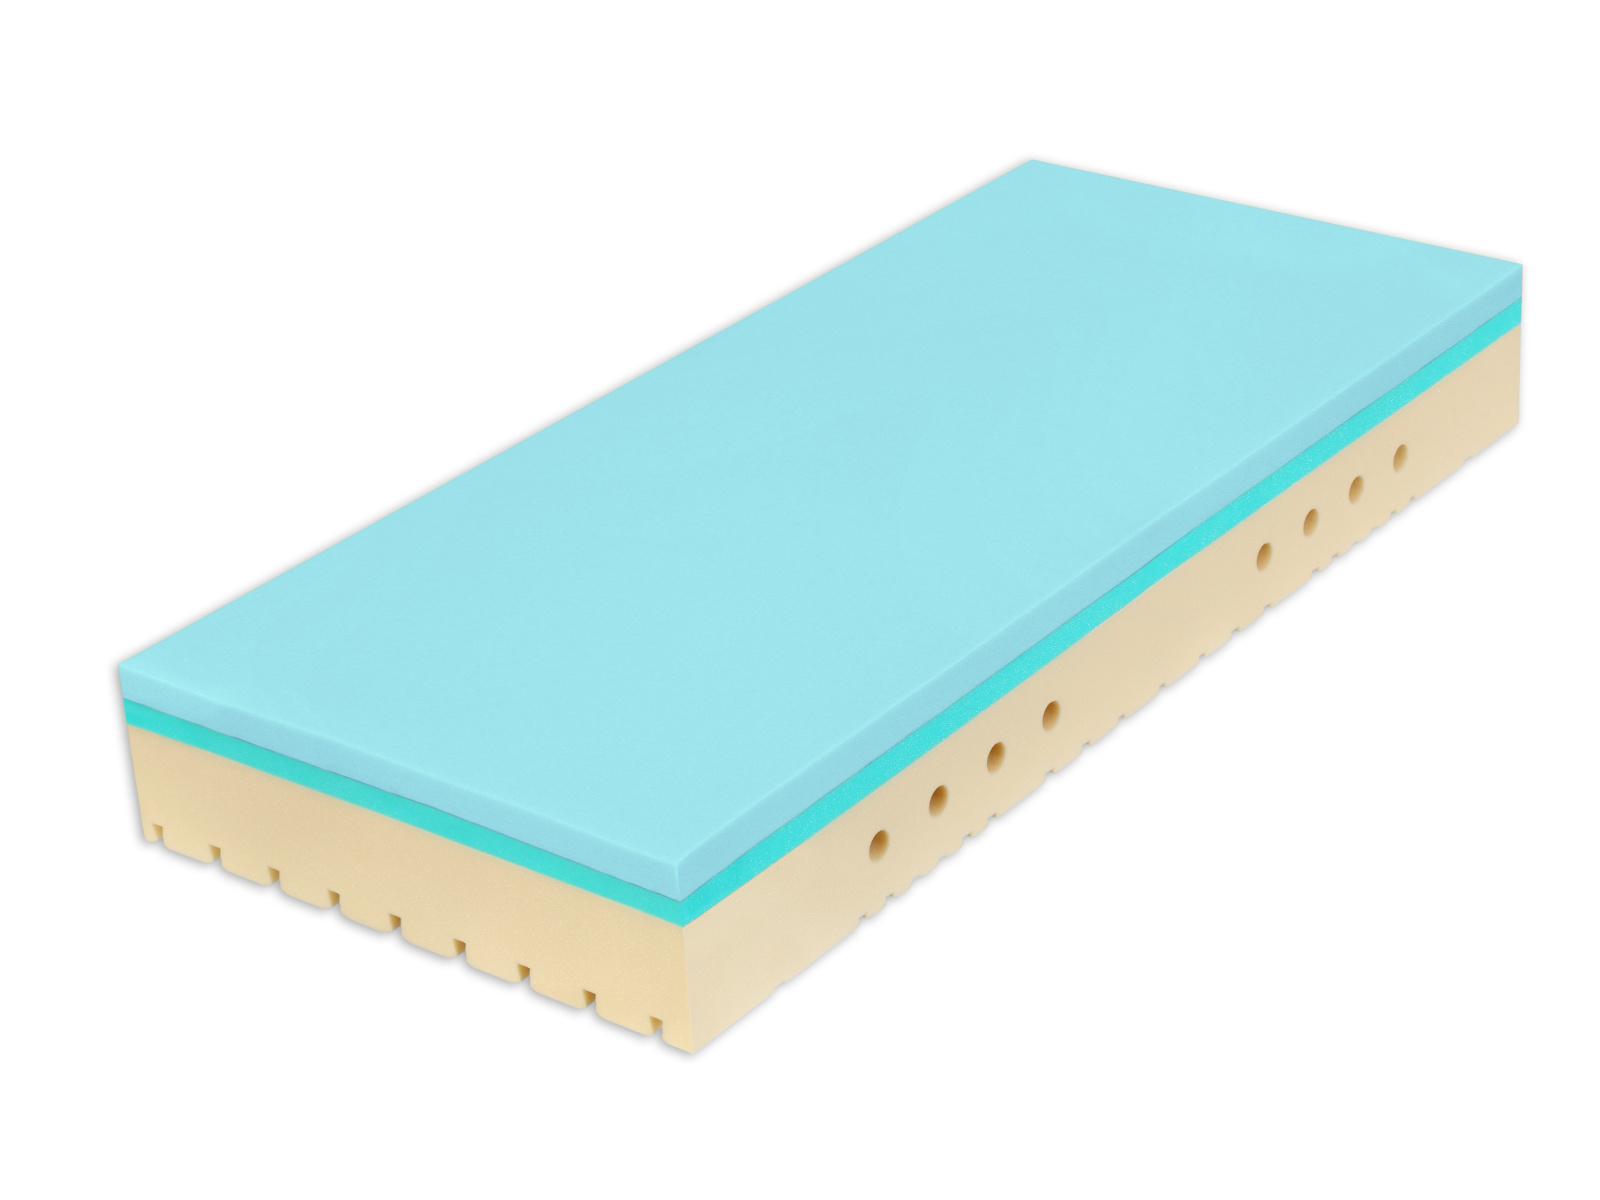 Matrace SUPER FOX BLUE Classic 90x200x22 cm, 1+1 ZDARMA